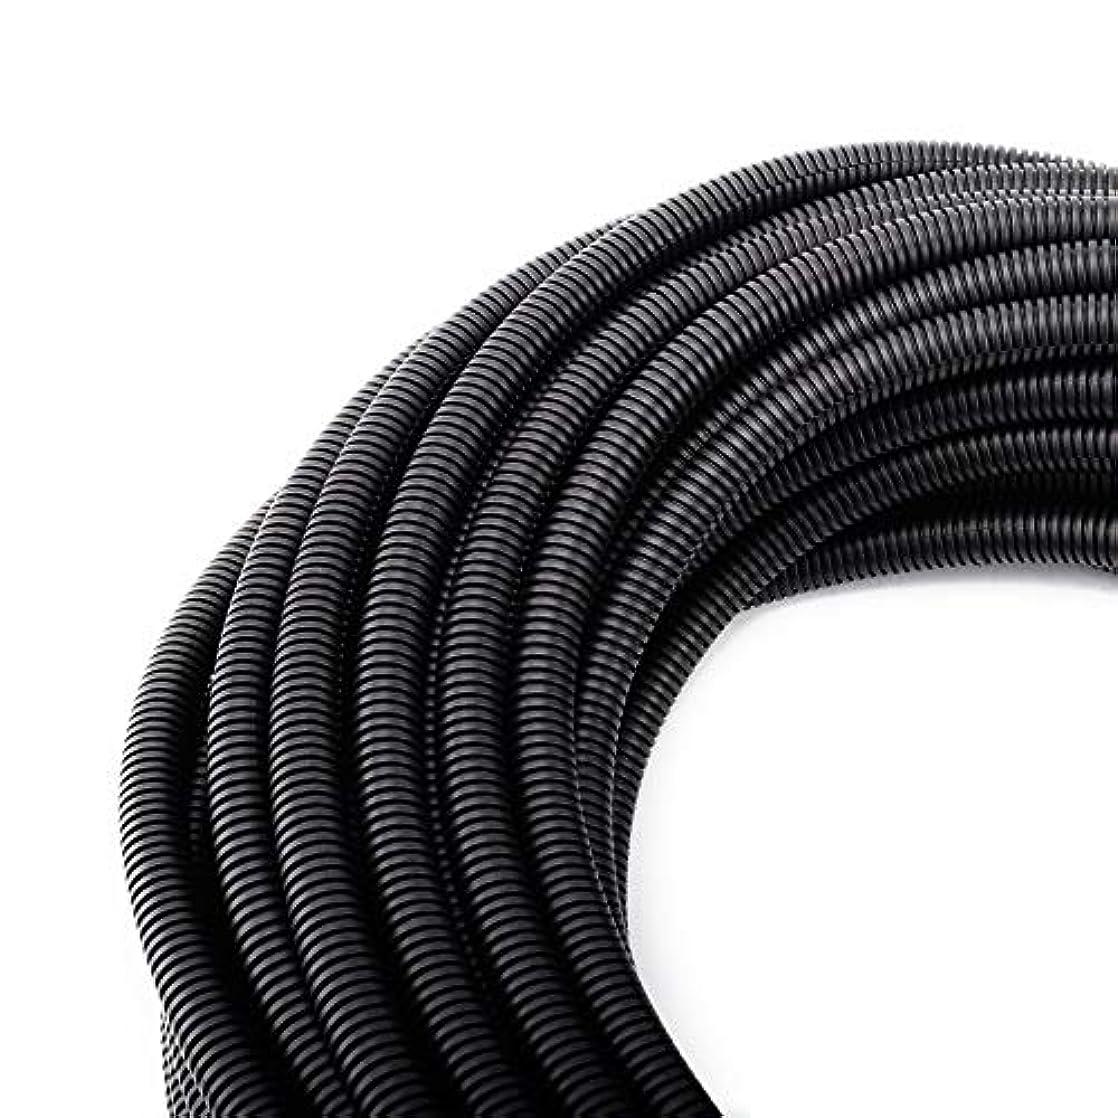 "50 FT 3/8"" Wire Loom Split Tubing Auto Wire Conduit Flexible Cover lcpeuffh45657"